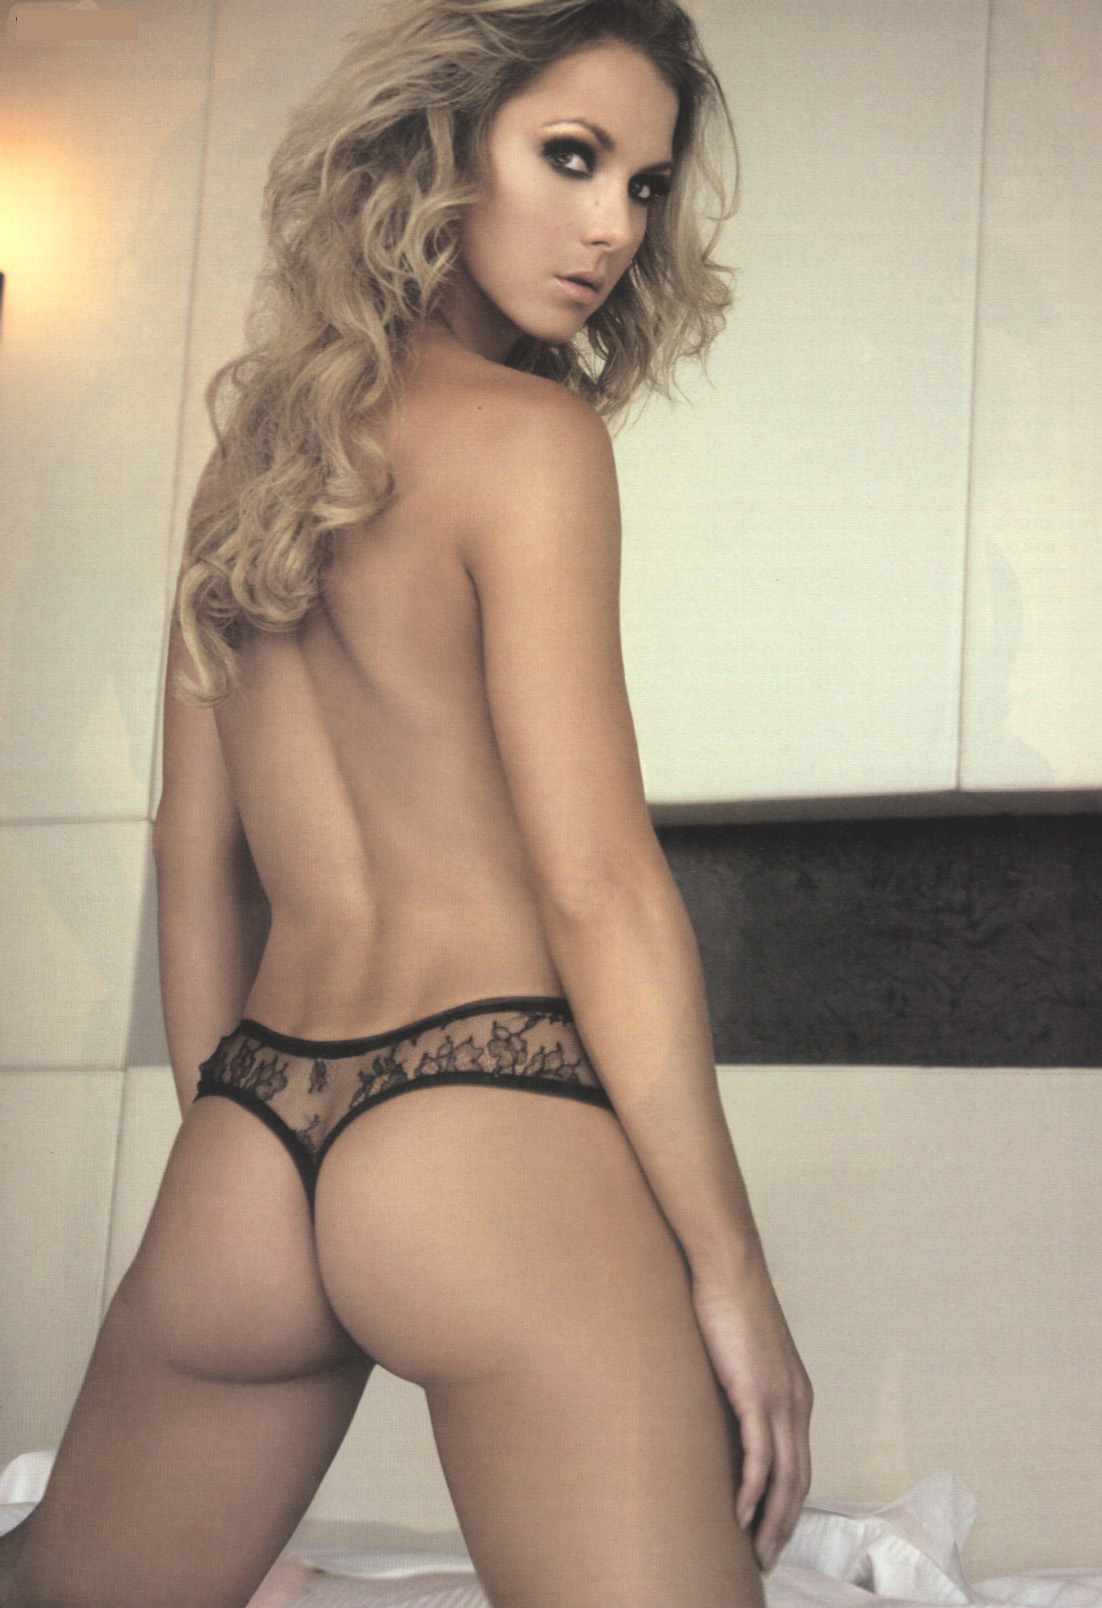 cecilia ponce nude